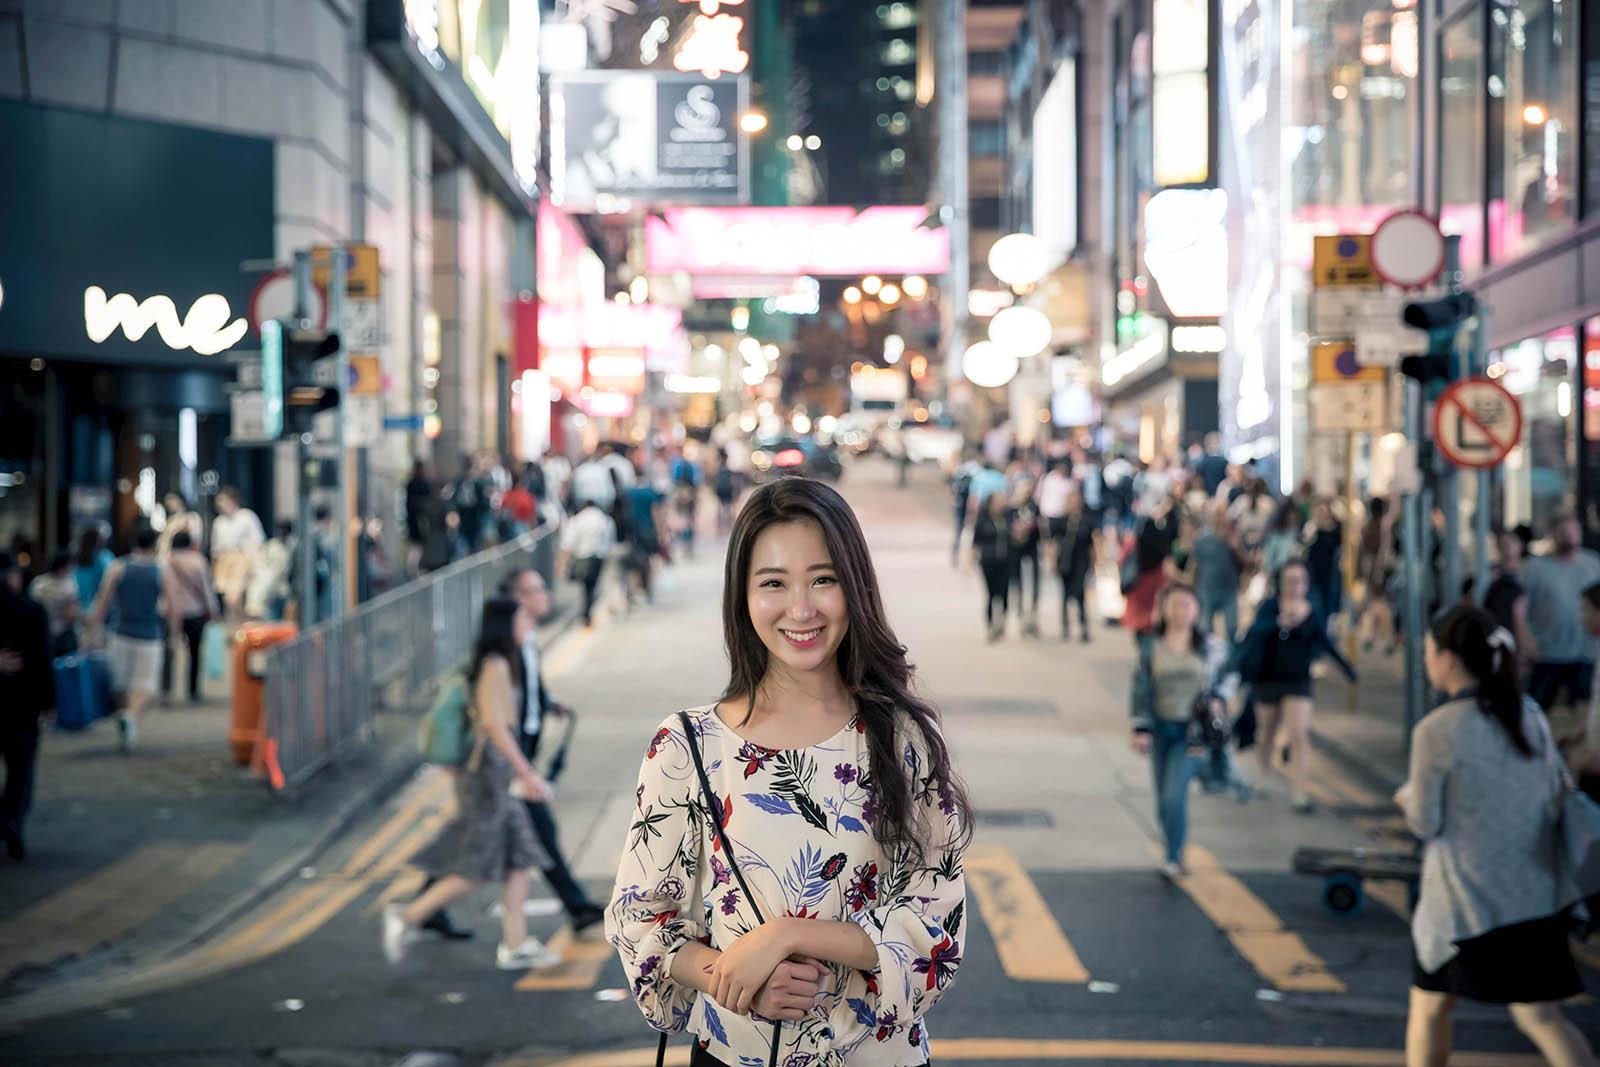 Sprazzi_Professional_Portrait_Photo_Hongkong_Kevin_Resize_1.jpg